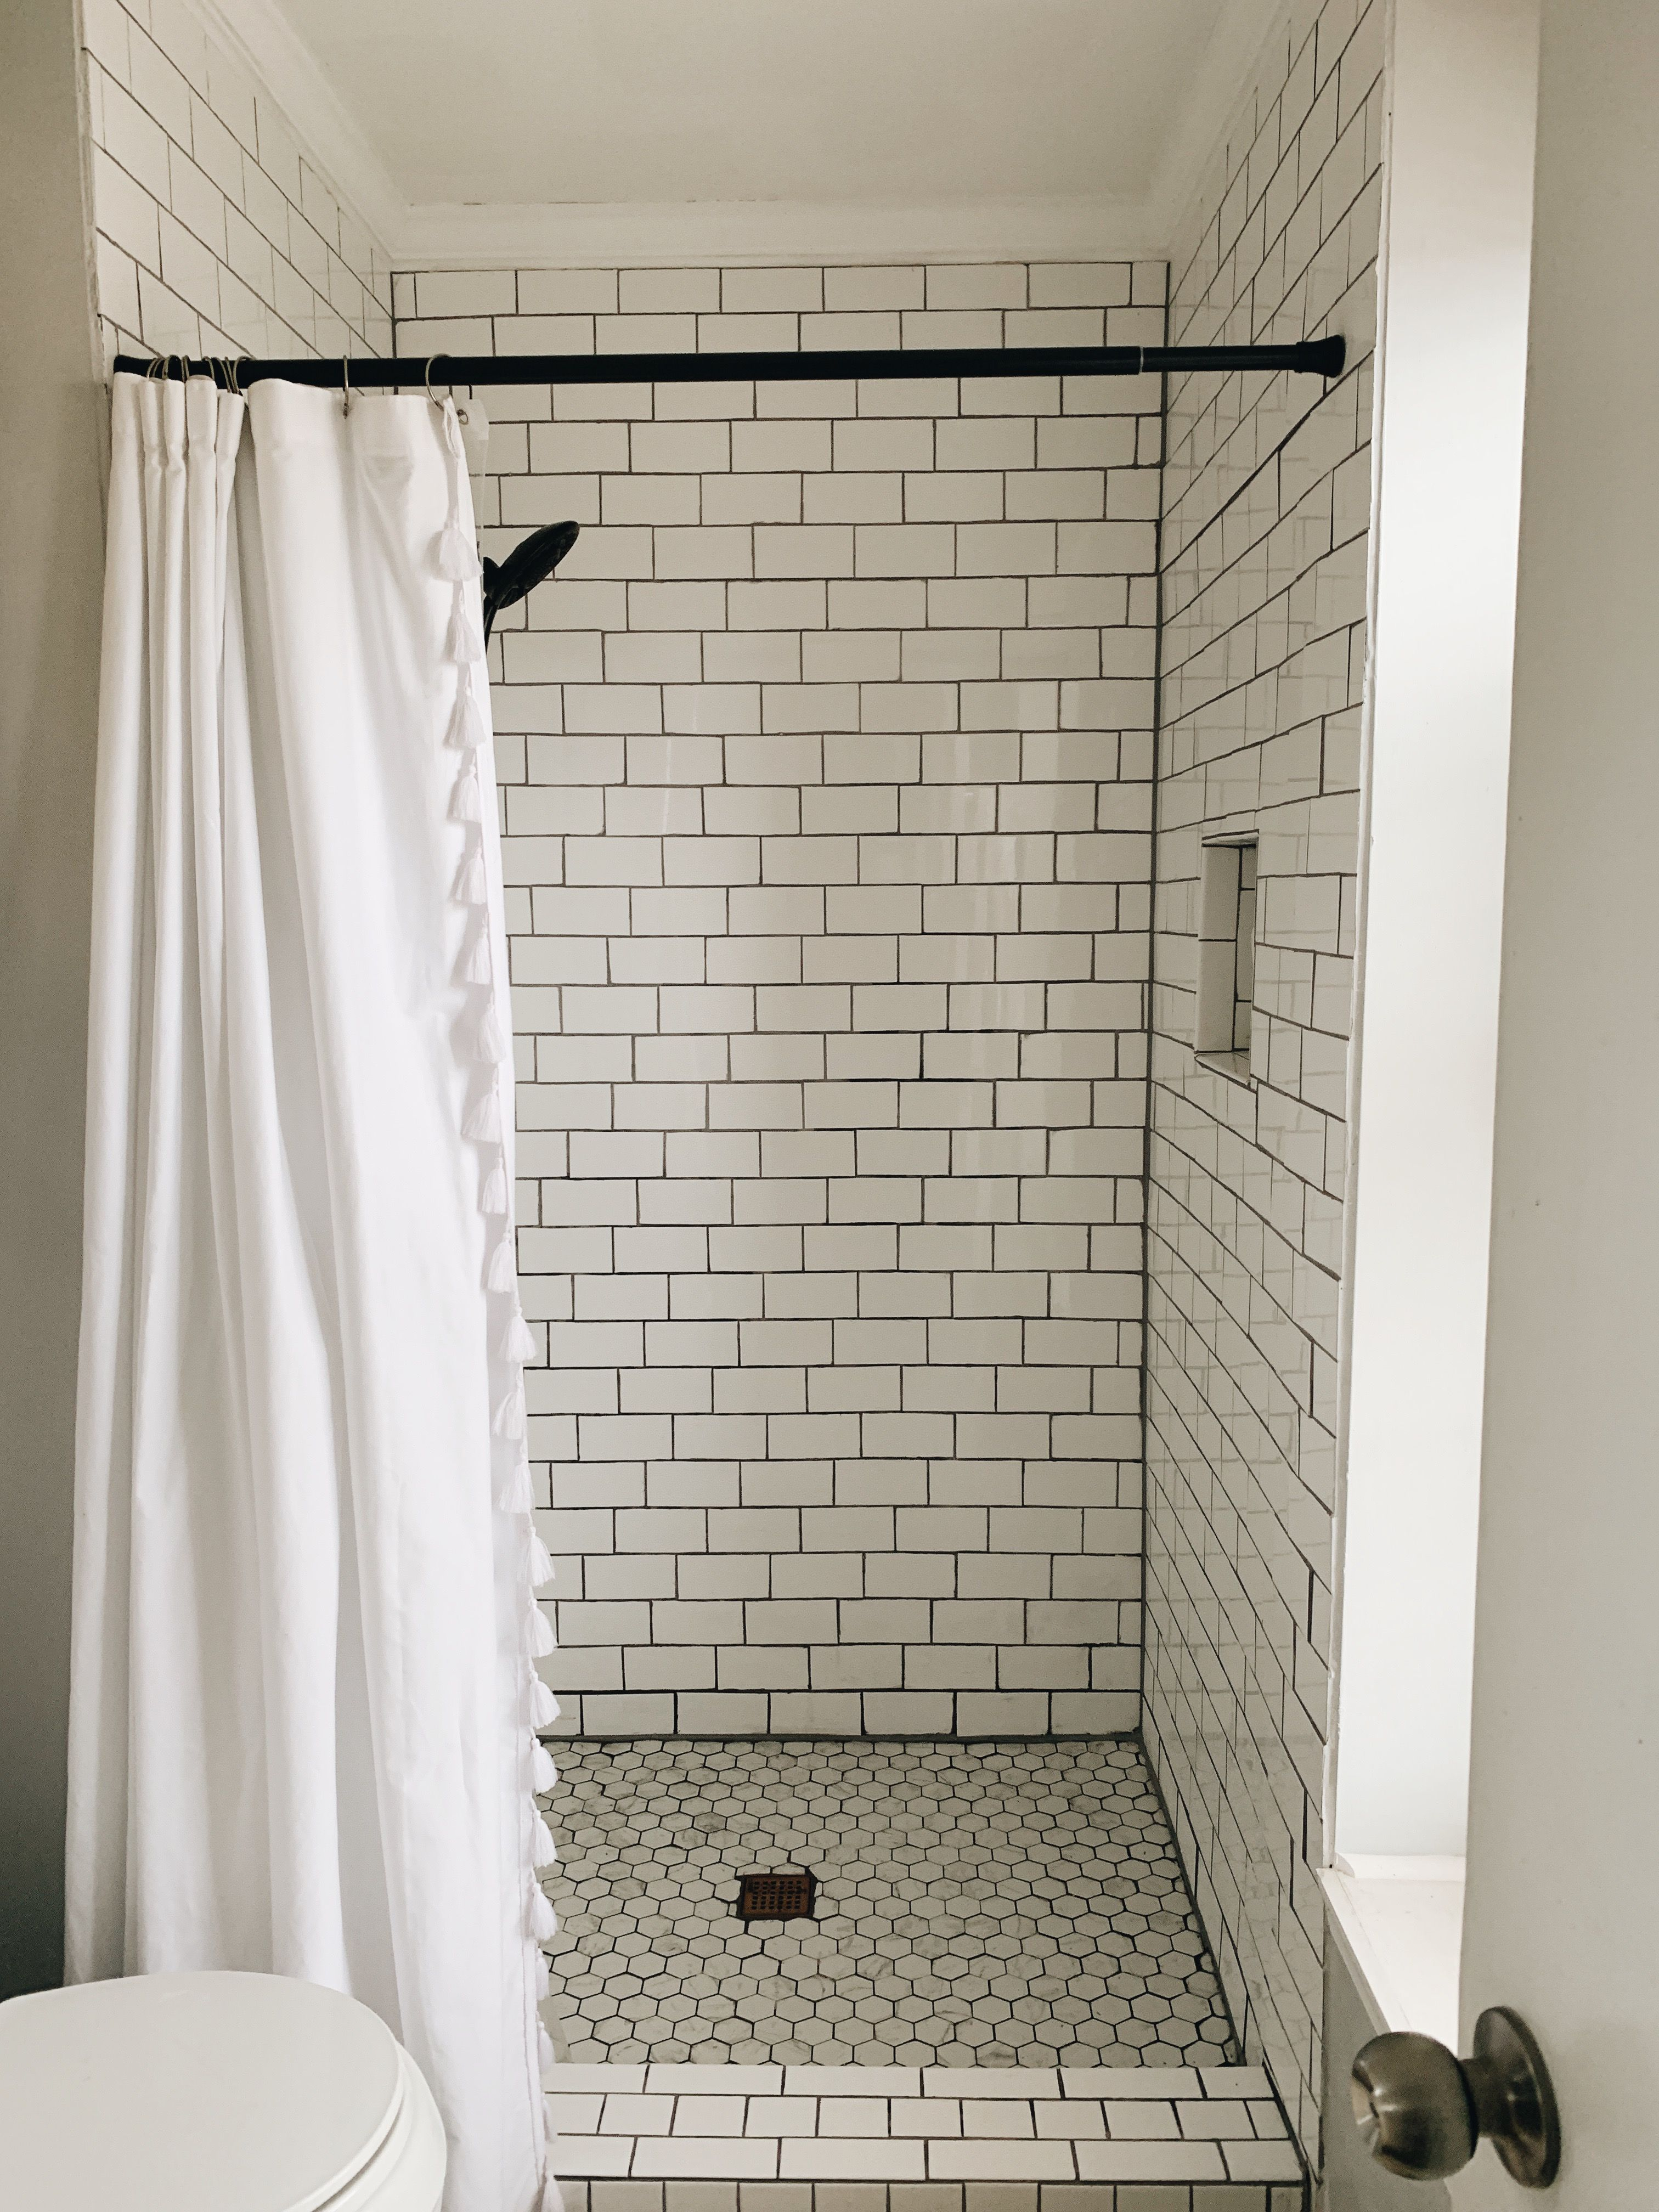 Diy Subway Tile Shower From Fiberglass Insert To Subway Tile